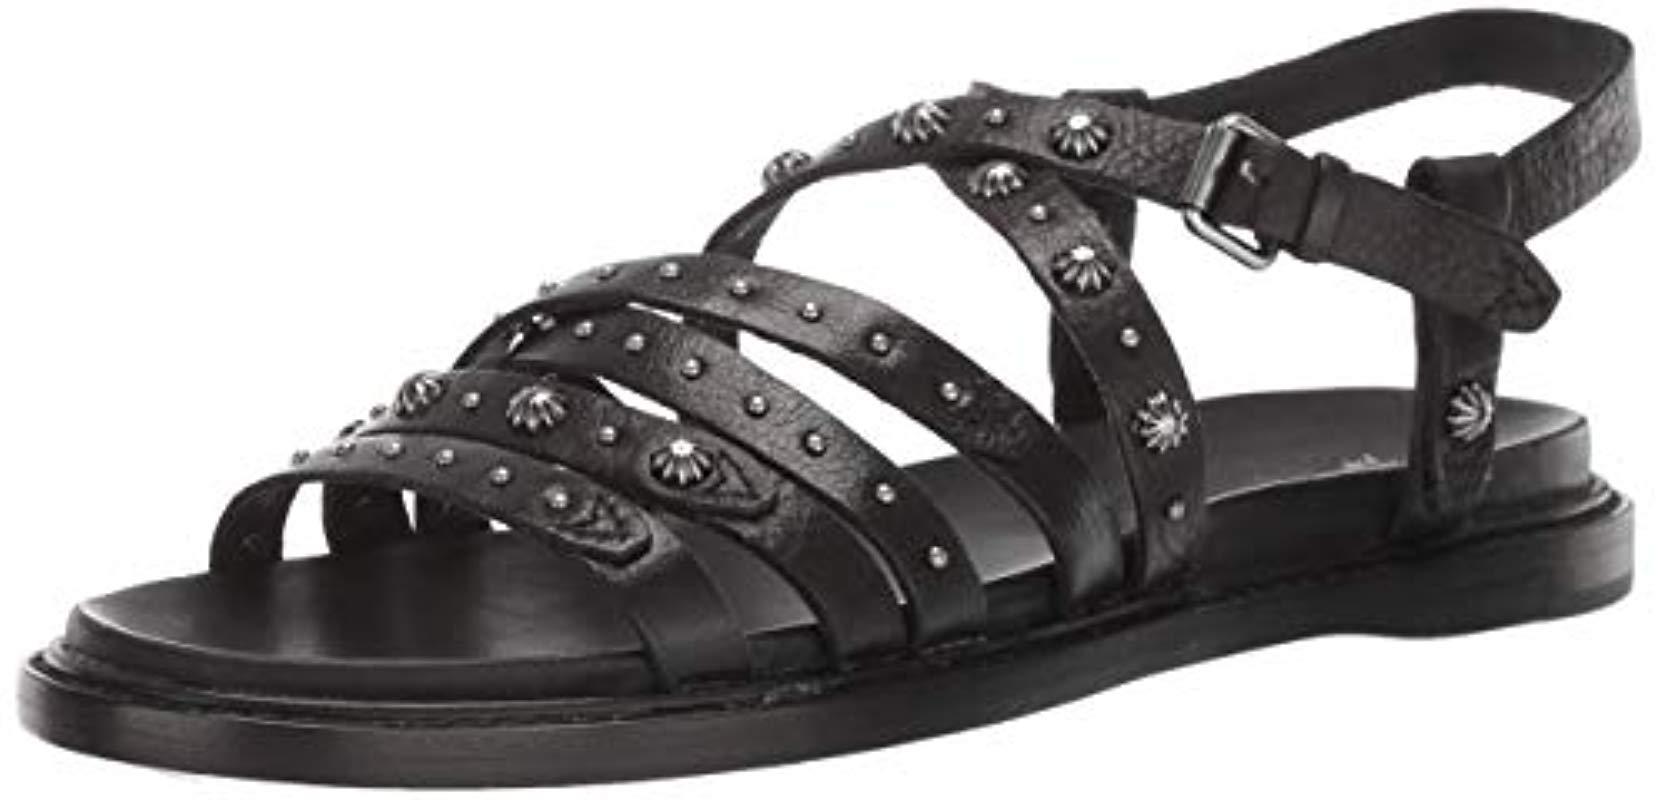 6a025981b8 Frye Andora Deco Strappy Sandal Flat in Black - Save 13% - Lyst